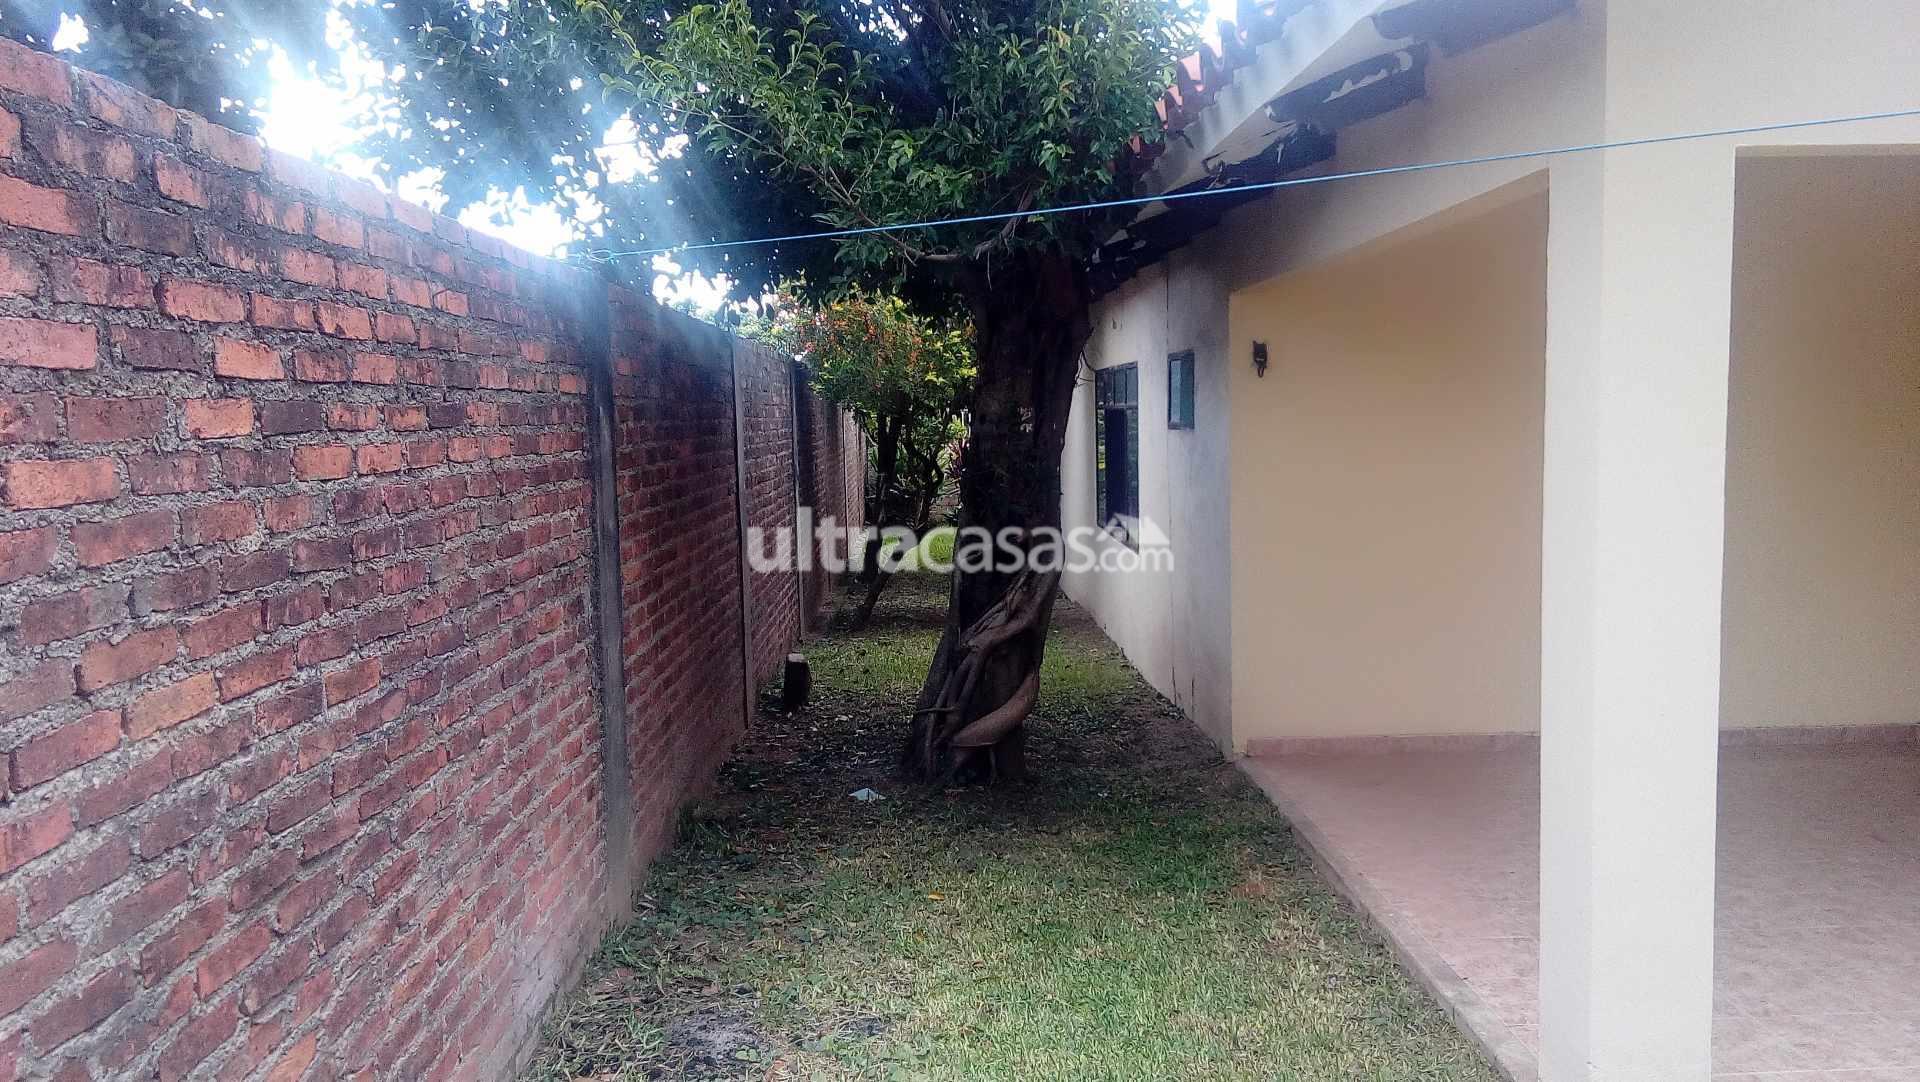 Casa en Venta Km 13 Doble Via a la Guardia  Foto 2